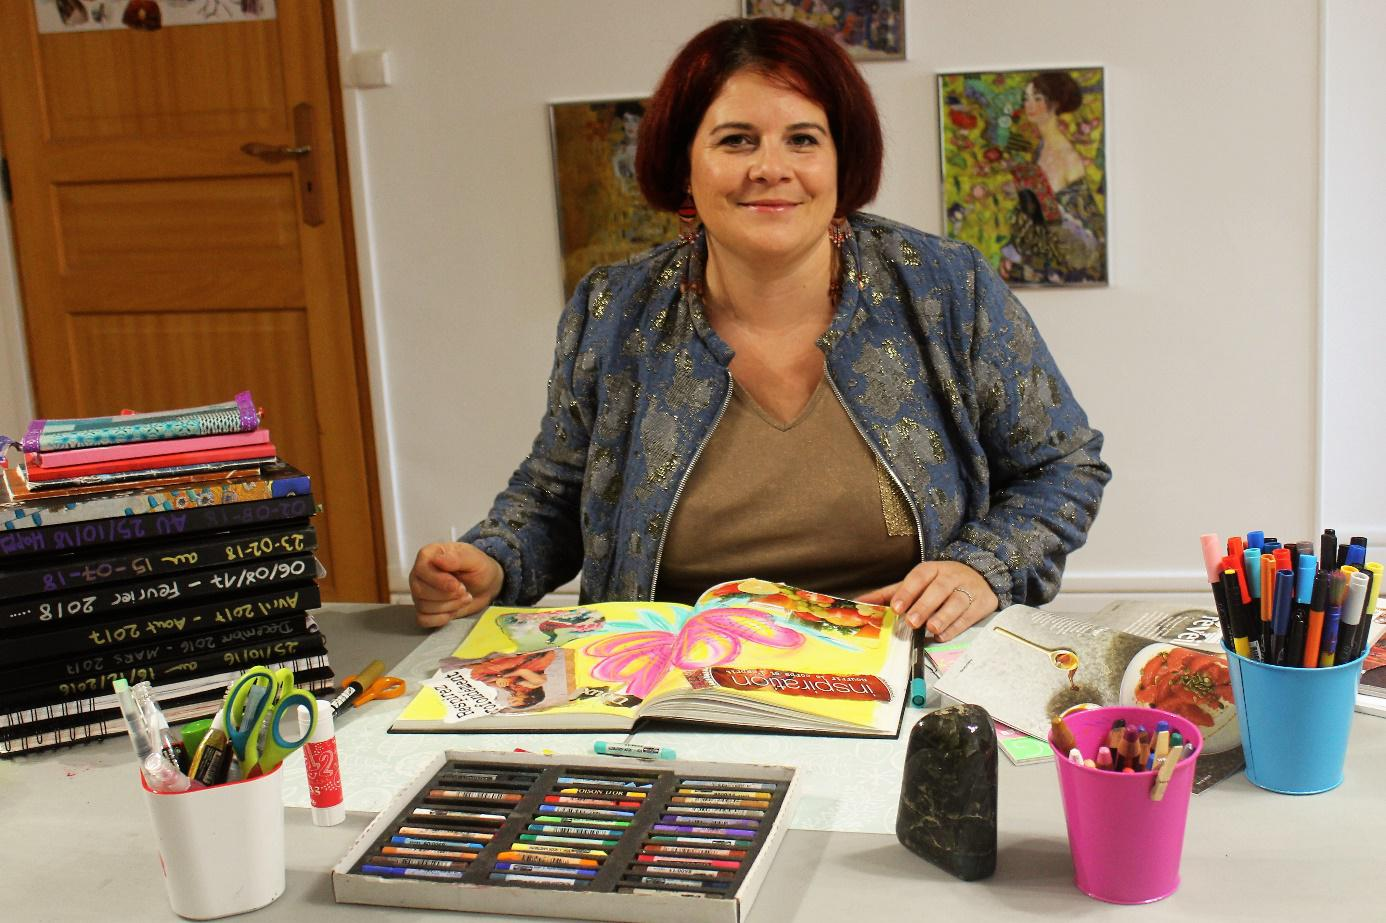 Maud CARROUE-BISVAL – Art thérapeute / Maincy 77